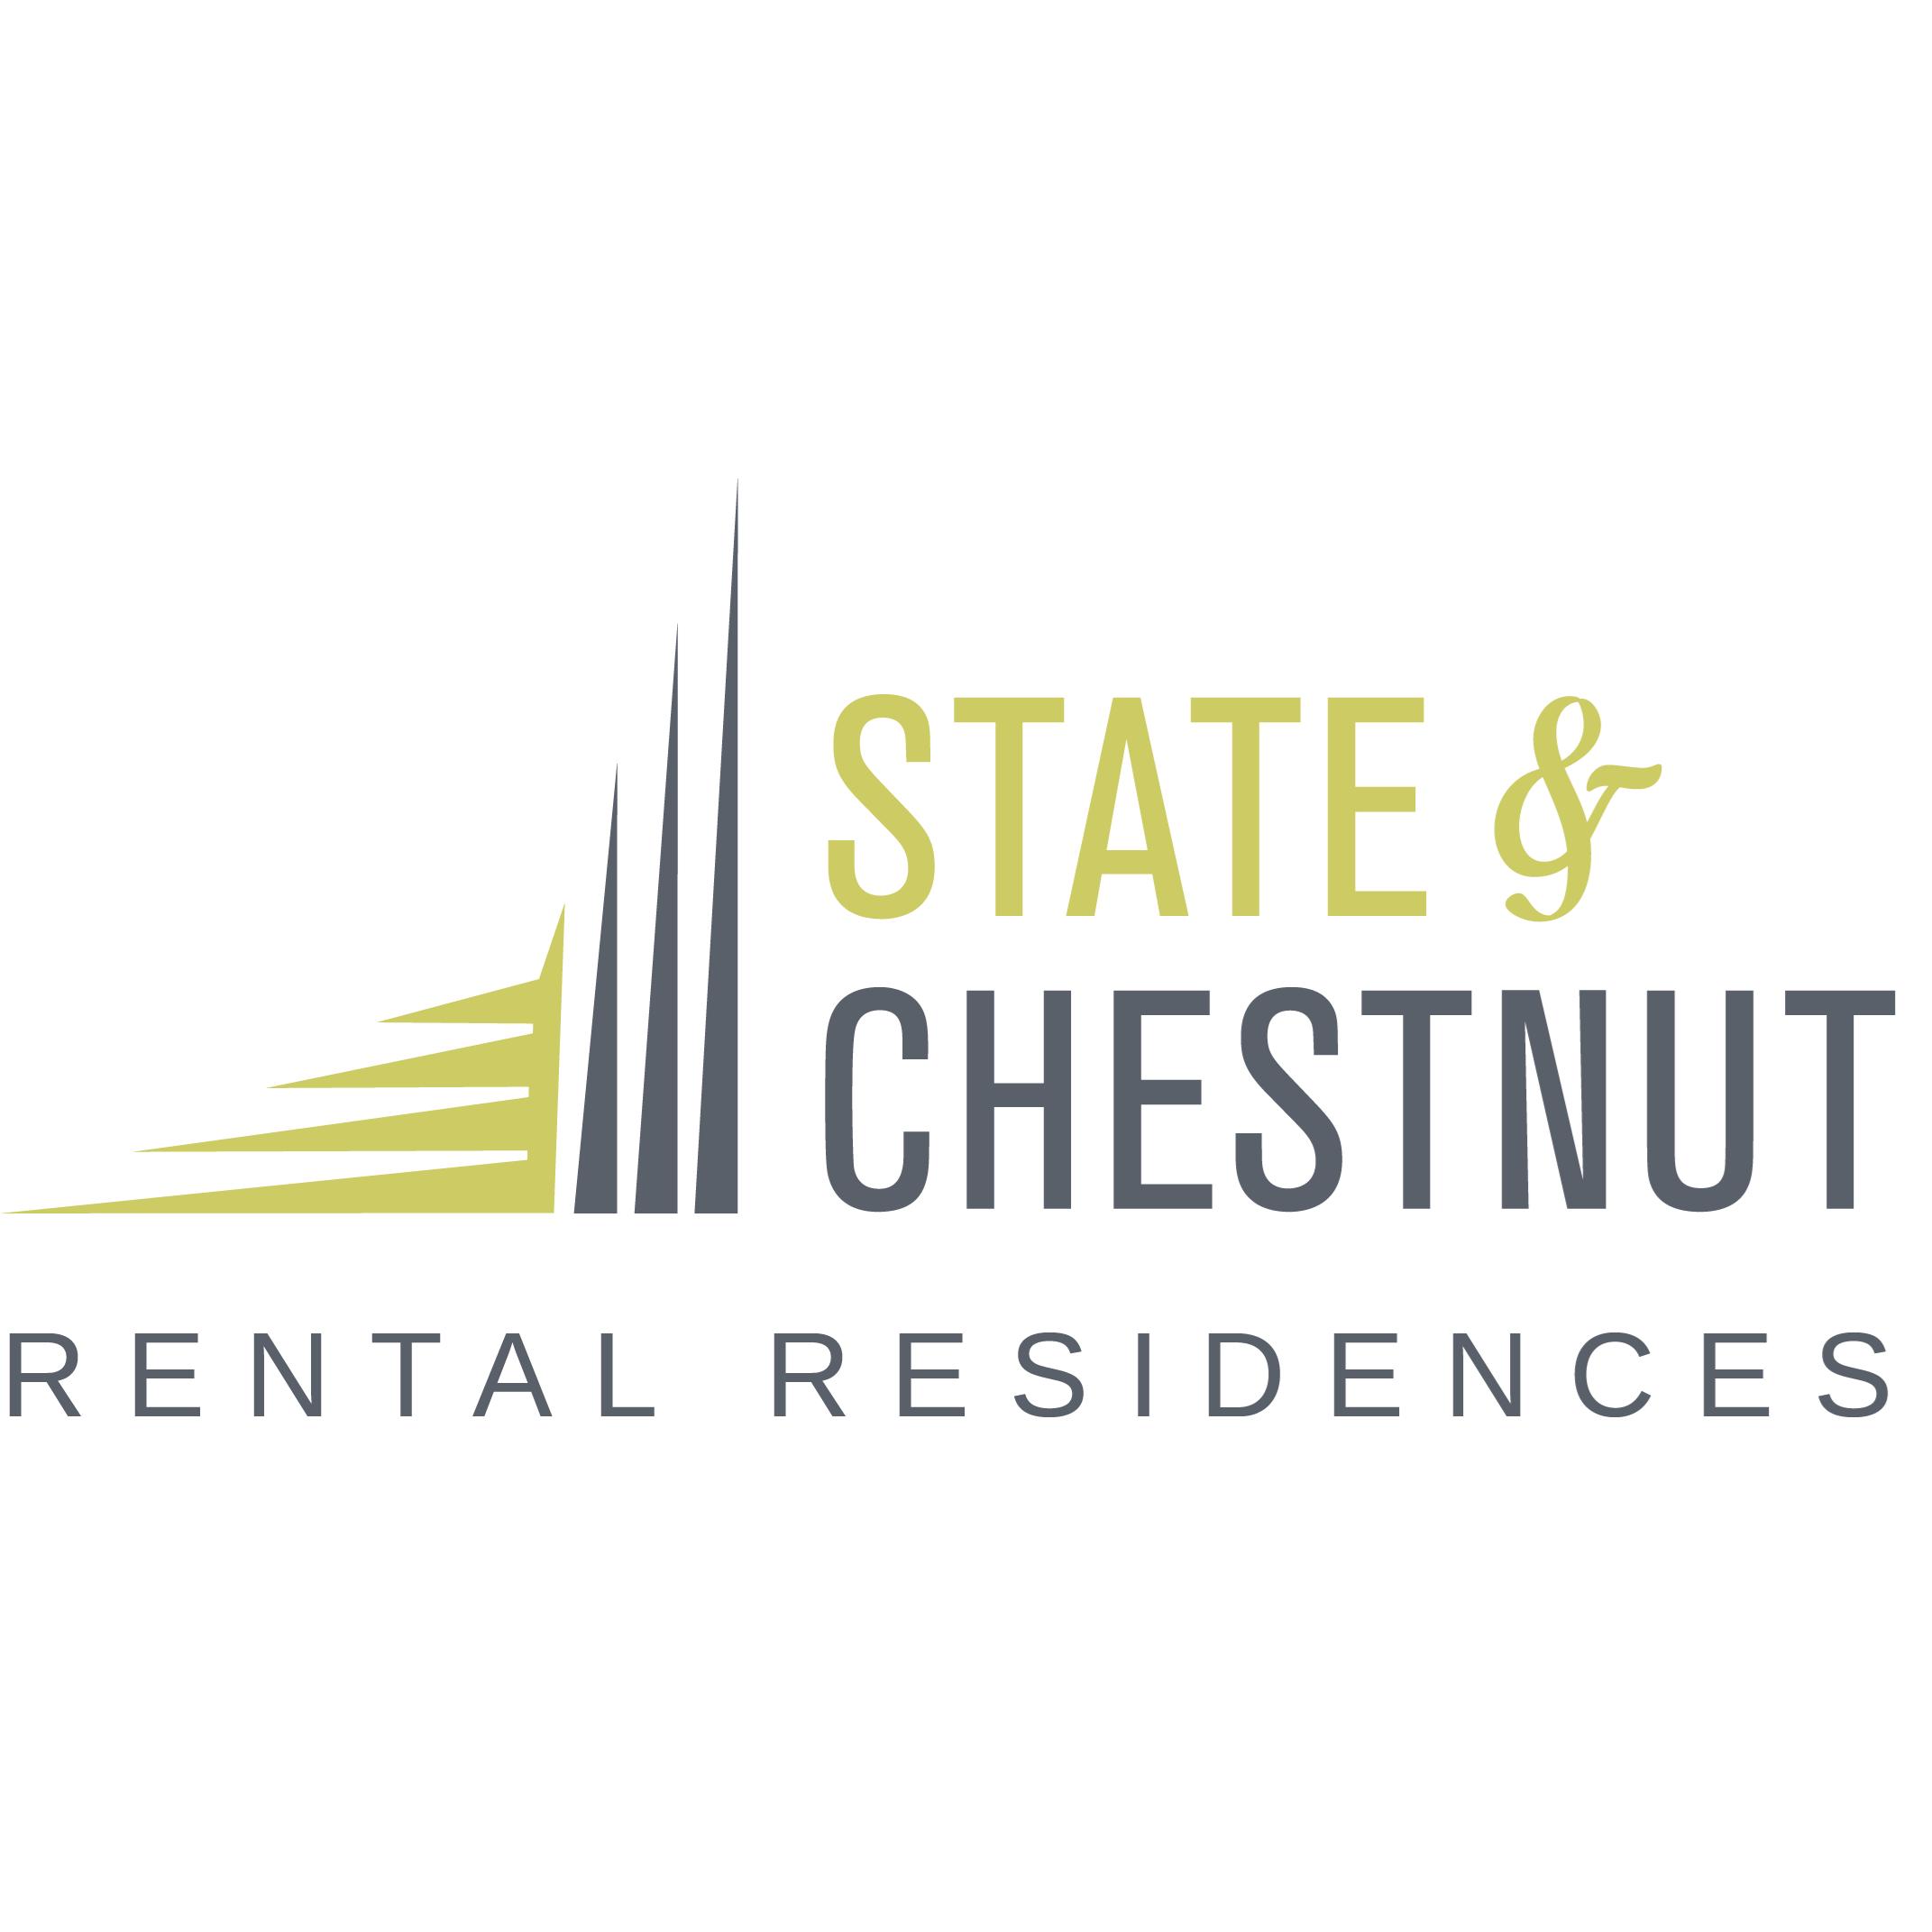 State & Chestnut